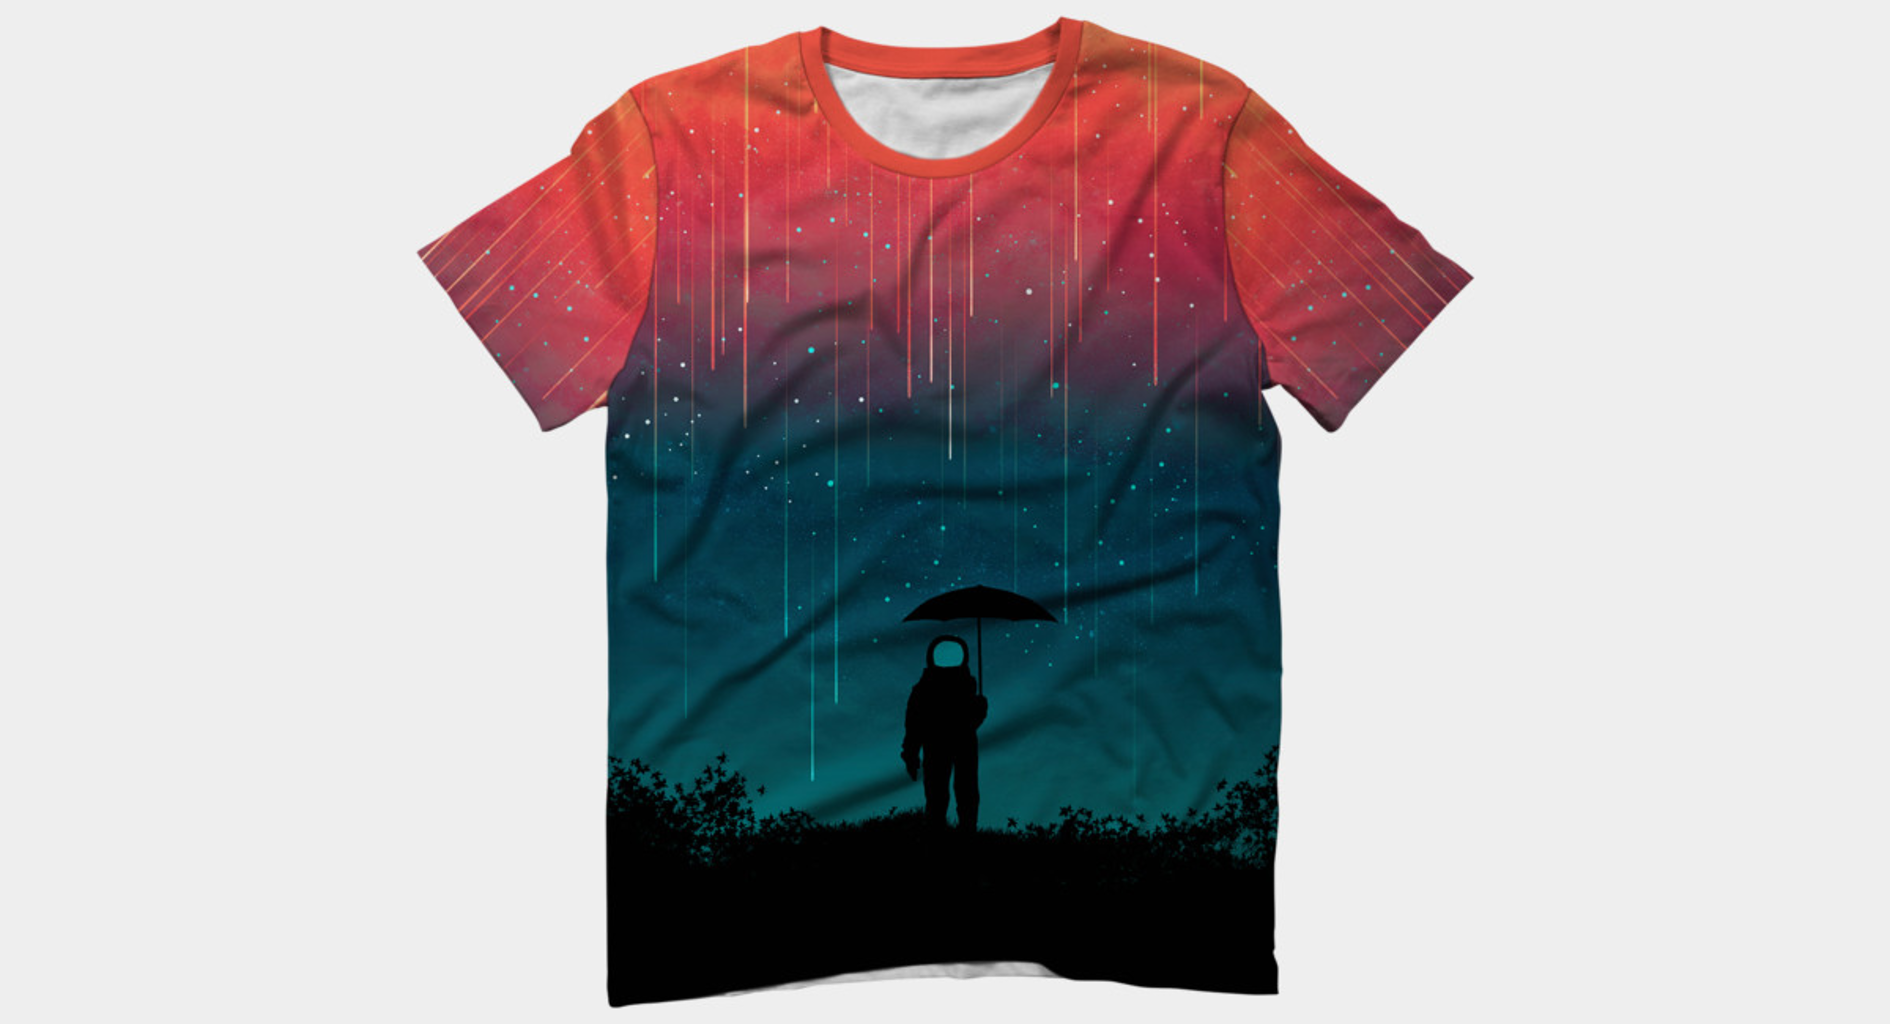 Design by Humans: Cosmic downpour